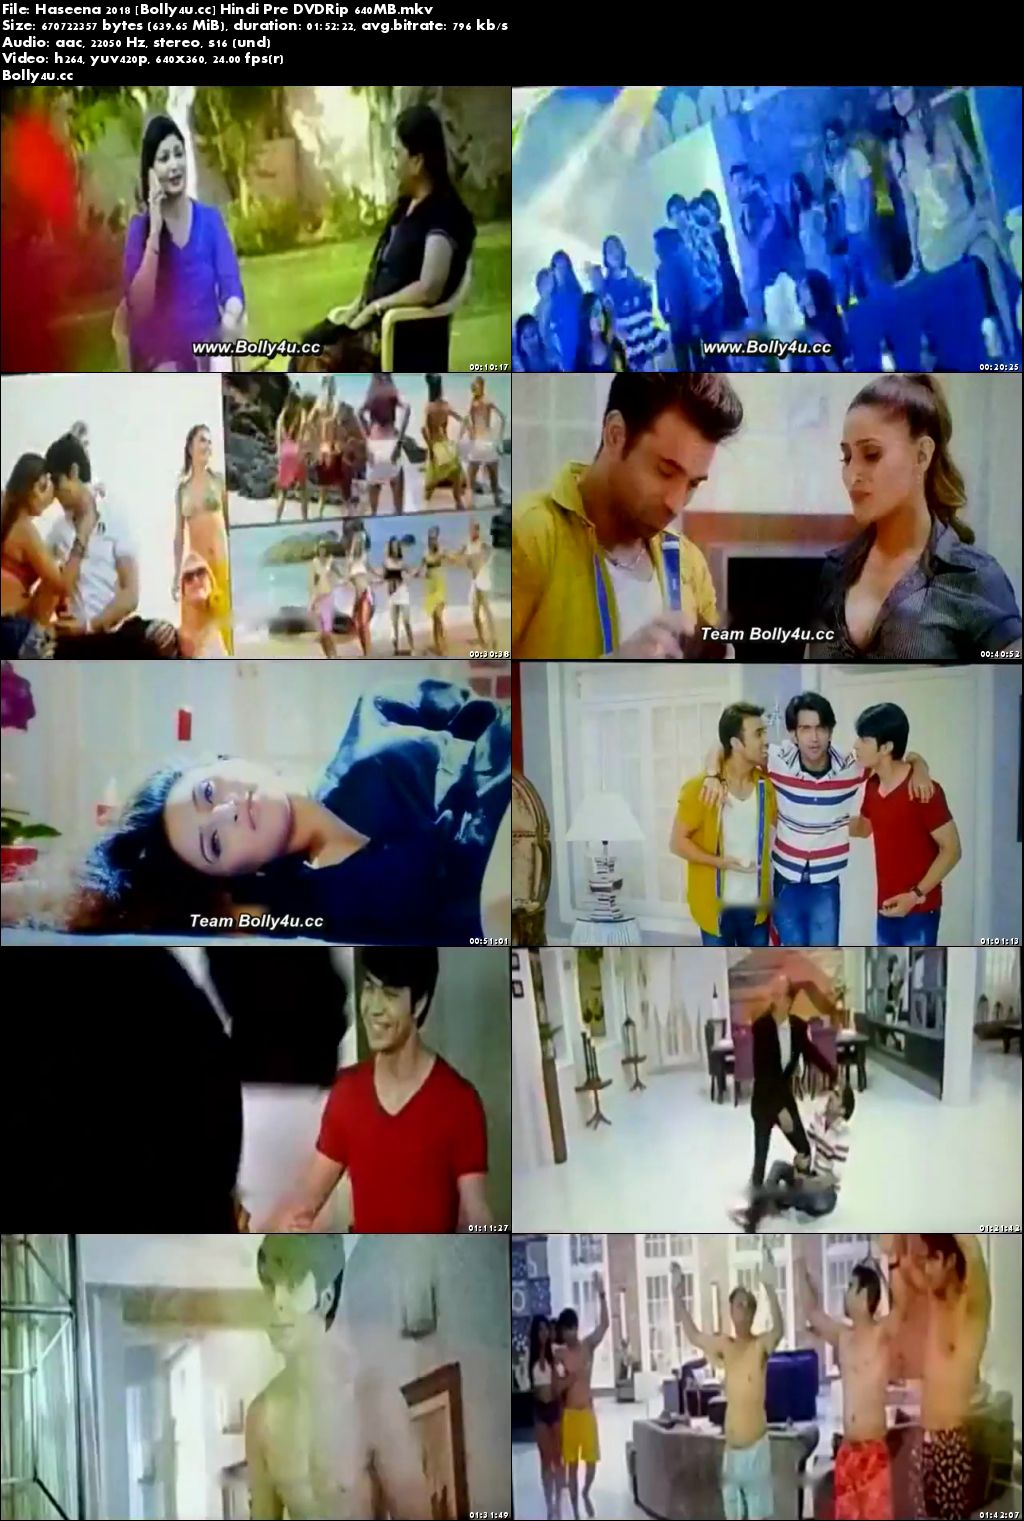 Haseena 2018 Pre DVDRip 650MB Full Hindi Movie Download x264